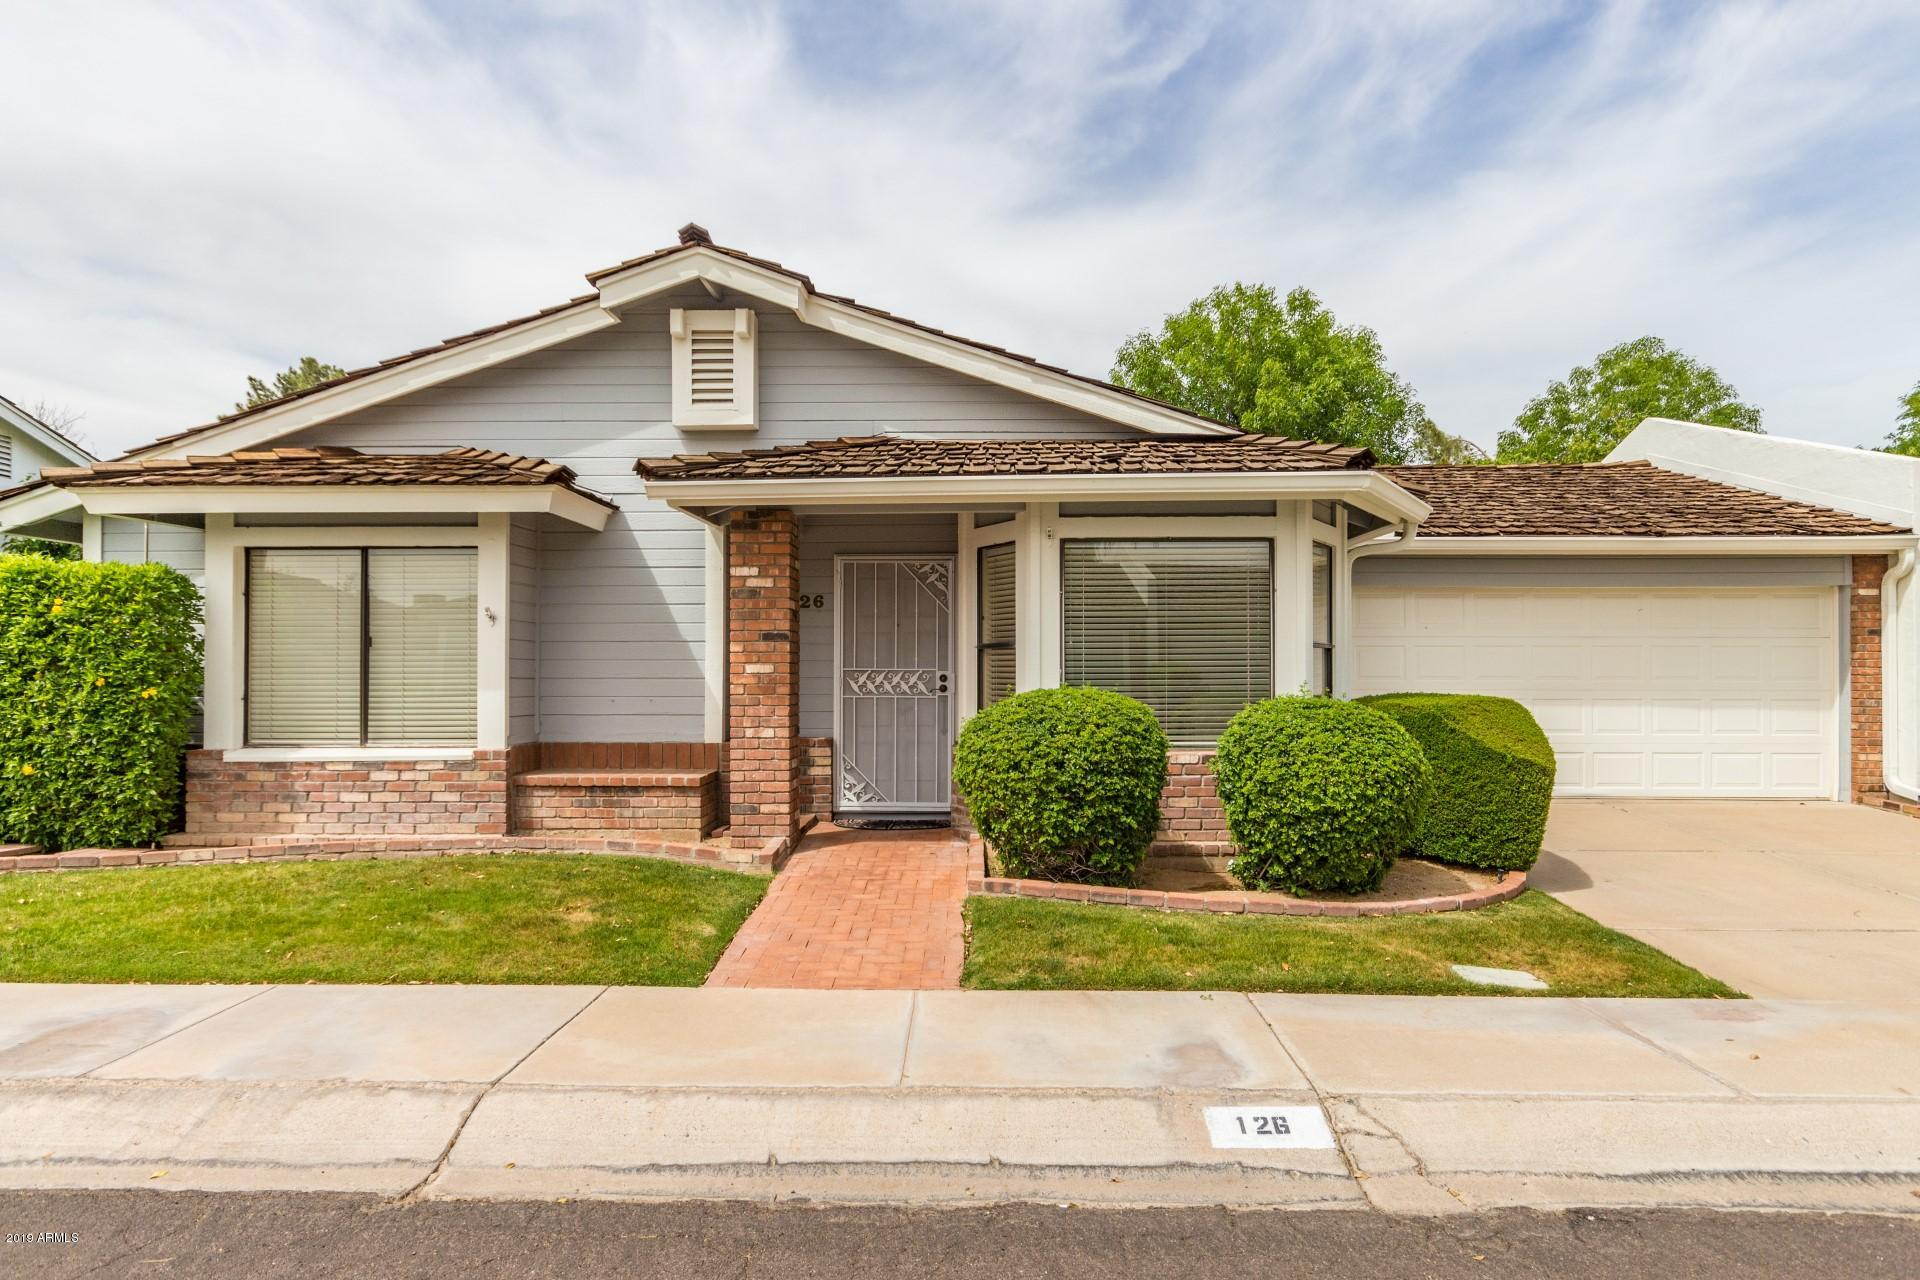 Photo of 126 E CAMPO BELLO Drive, Phoenix, AZ 85022